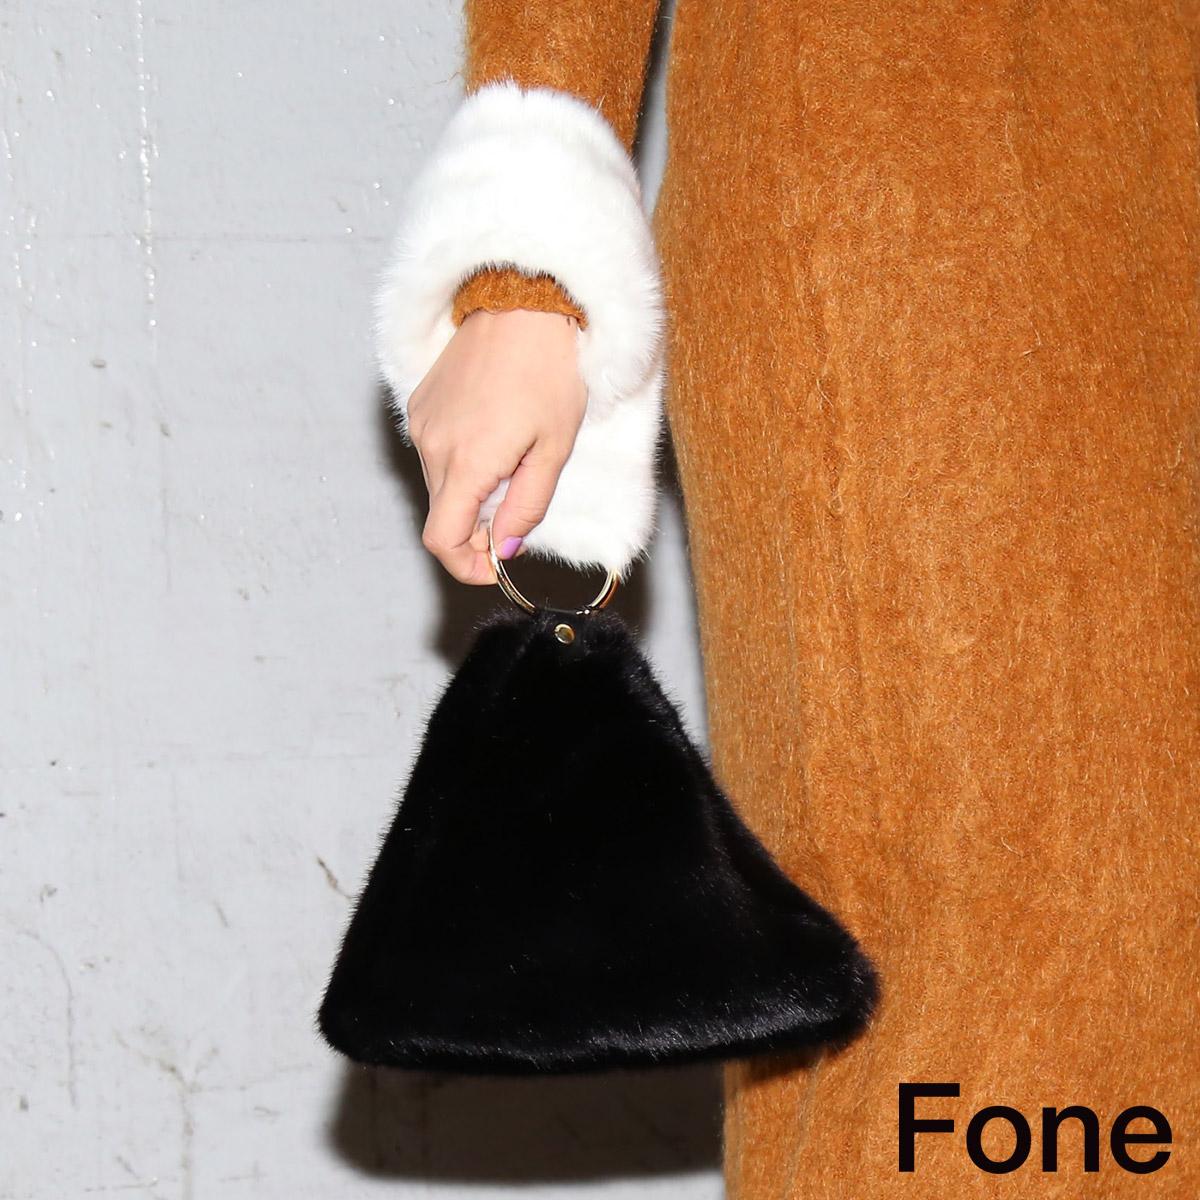 Fone フェイクファー配色 クラッチバッグ(エフワン フェイクファー配色 クラッチバッグ)WHITE×BLACK【レディース クラッチバッグ】17FA-I